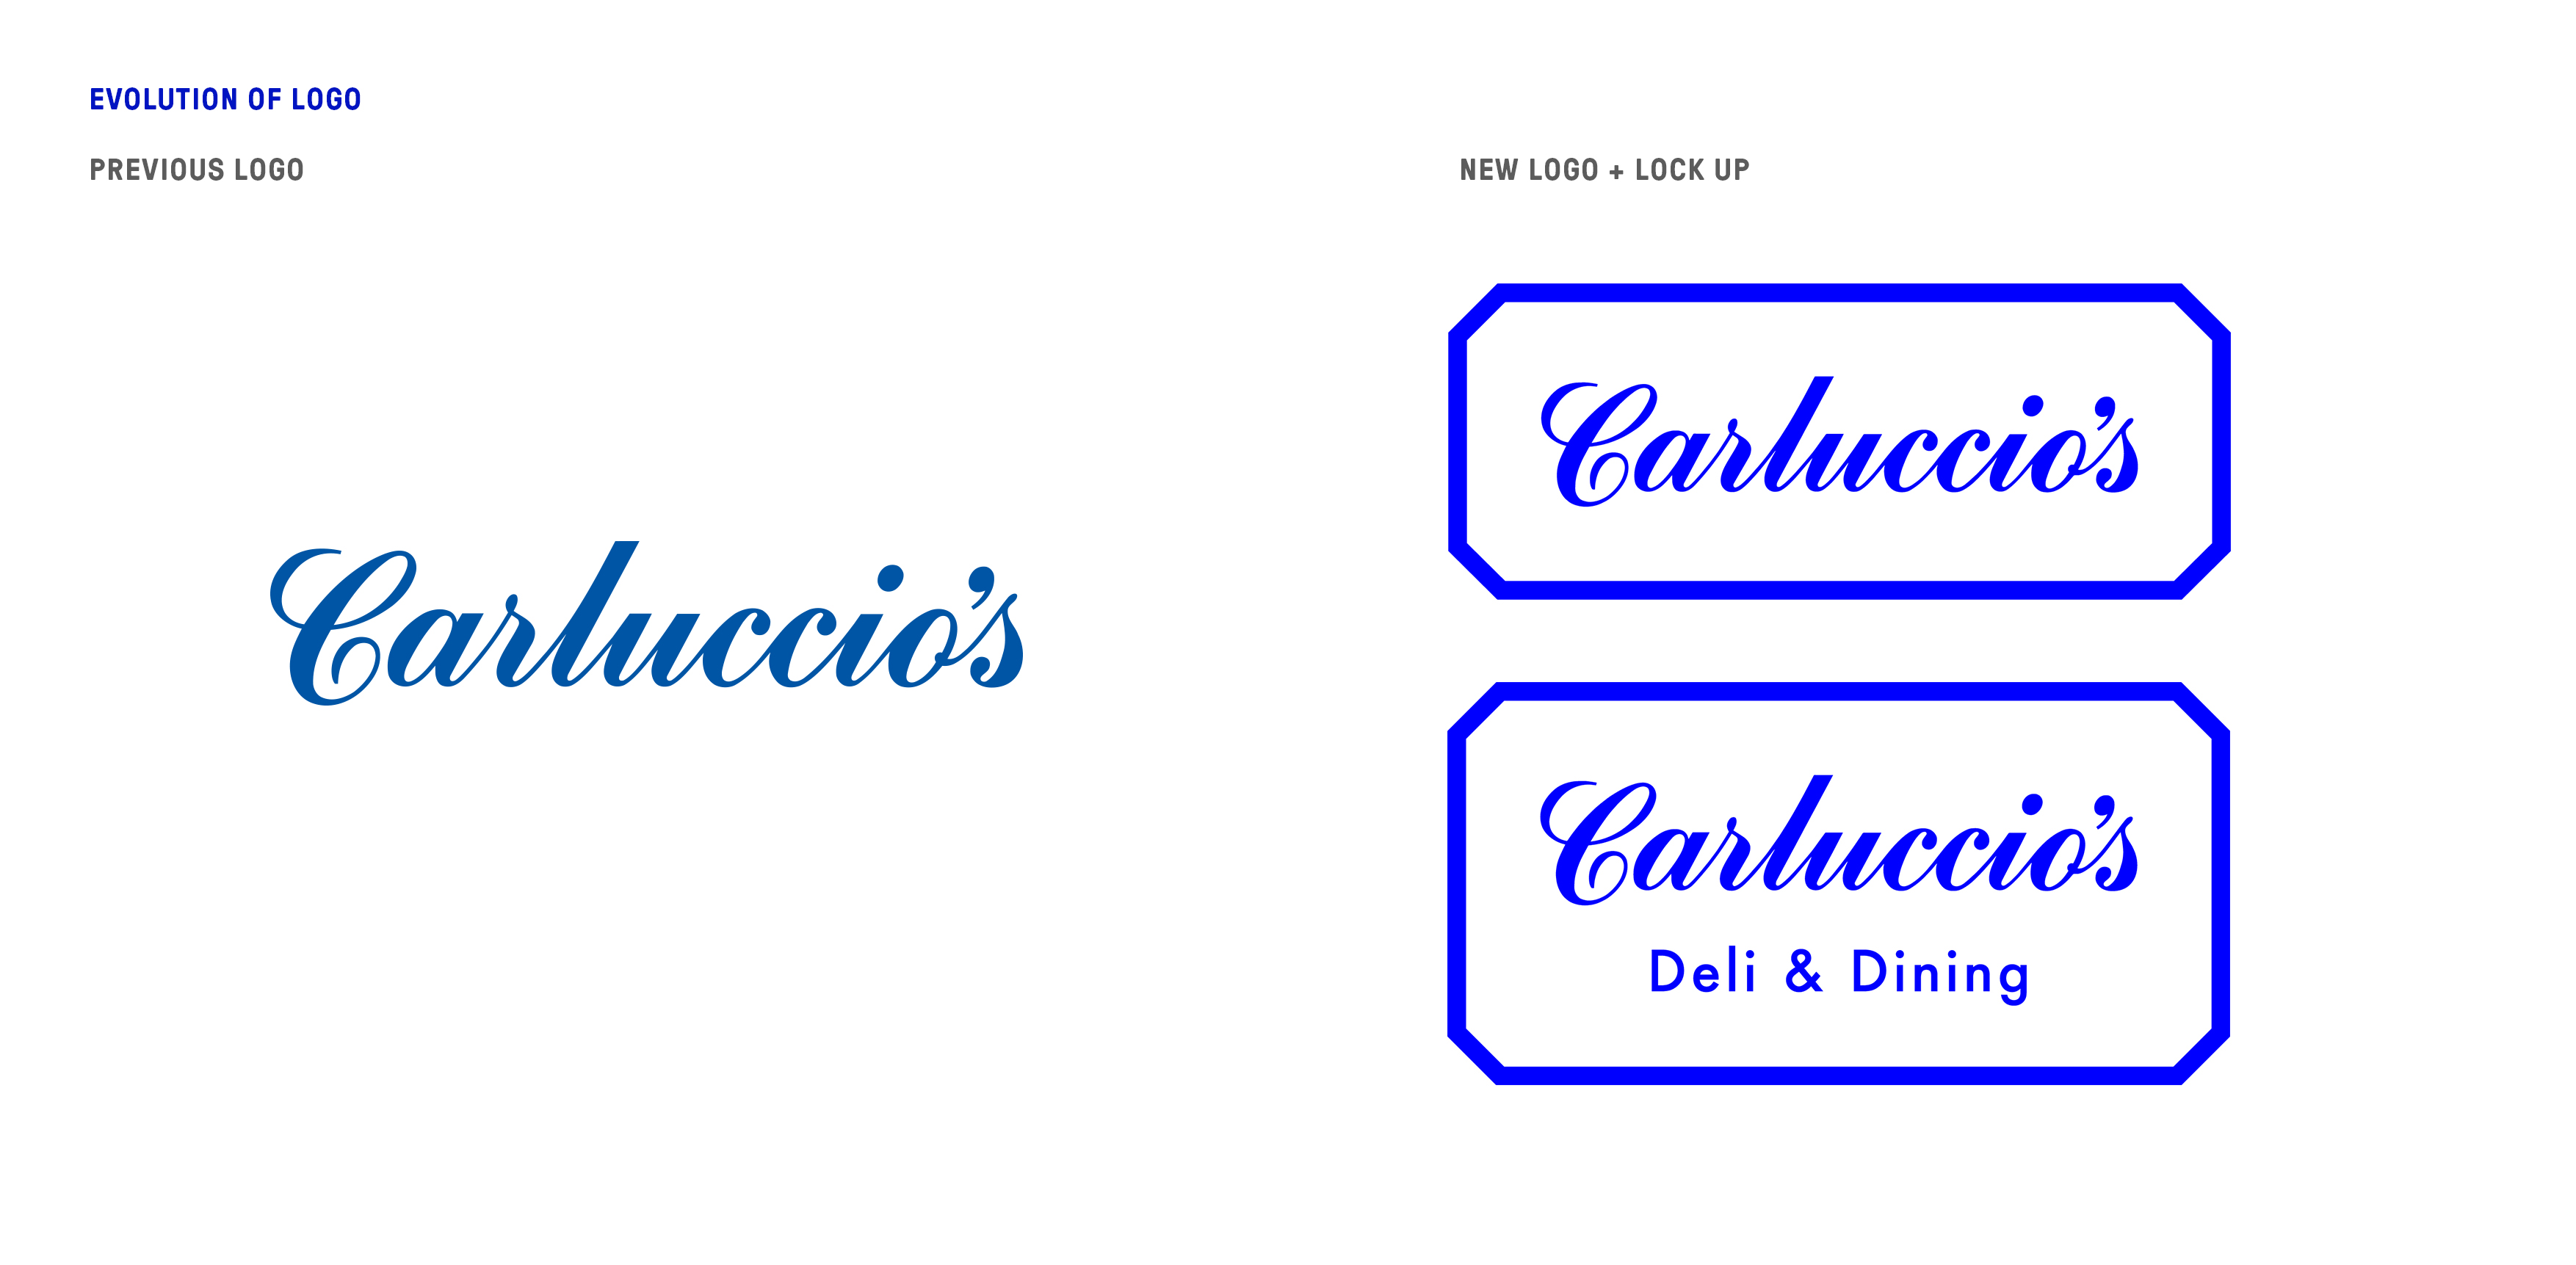 evolution-of-logo